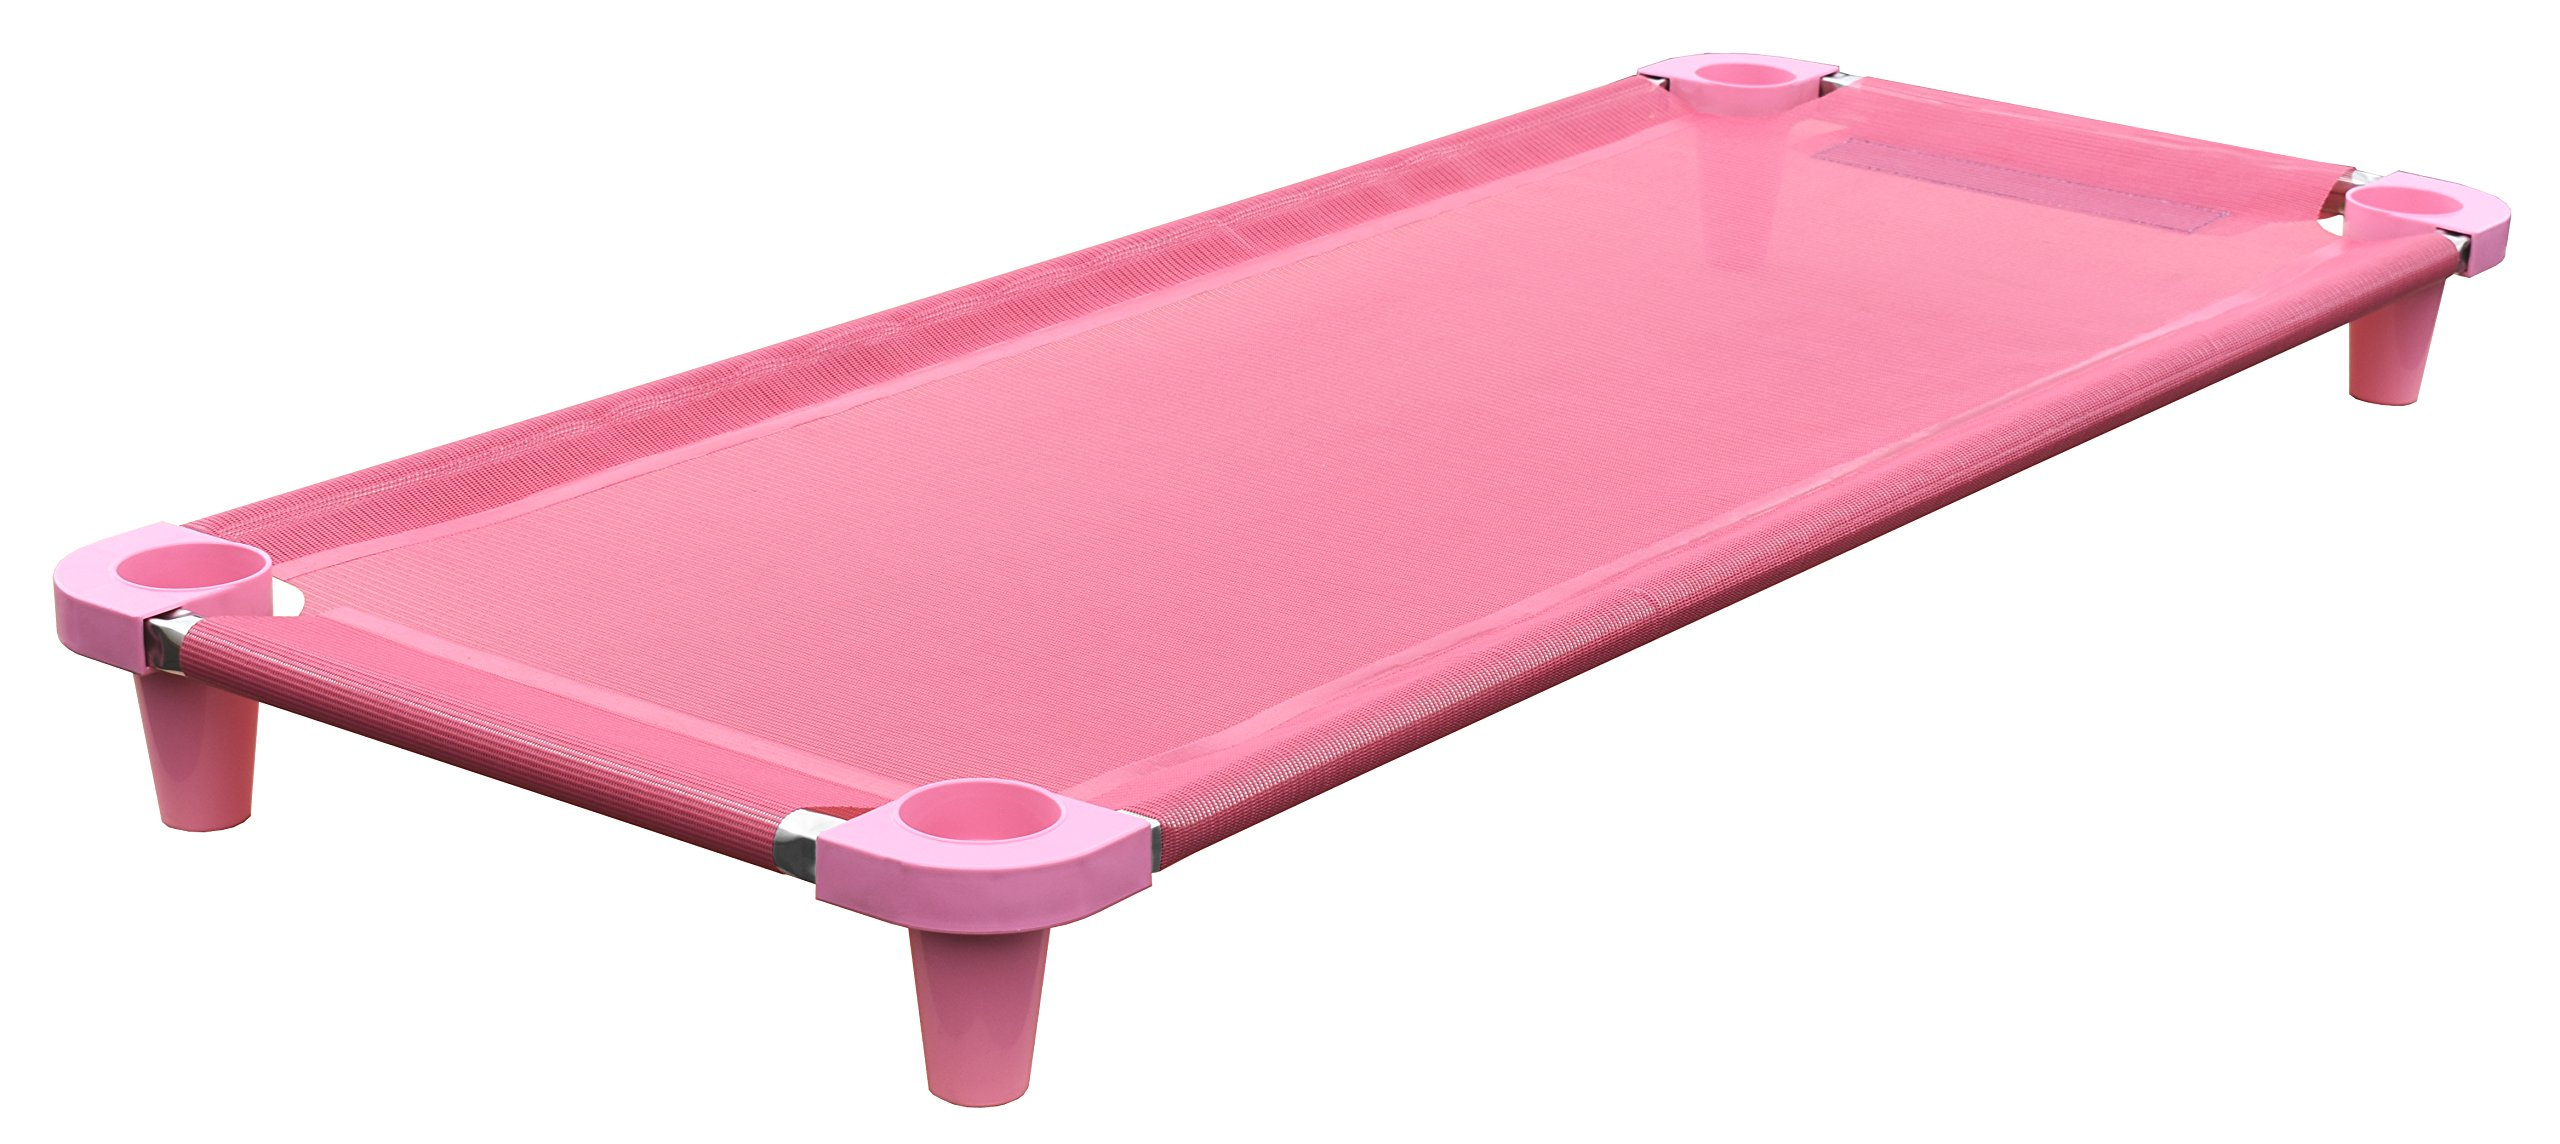 Acrimet Premium Stackable Nap Cot (Stainless Steel Tubes) (Pink) (1 Unit)